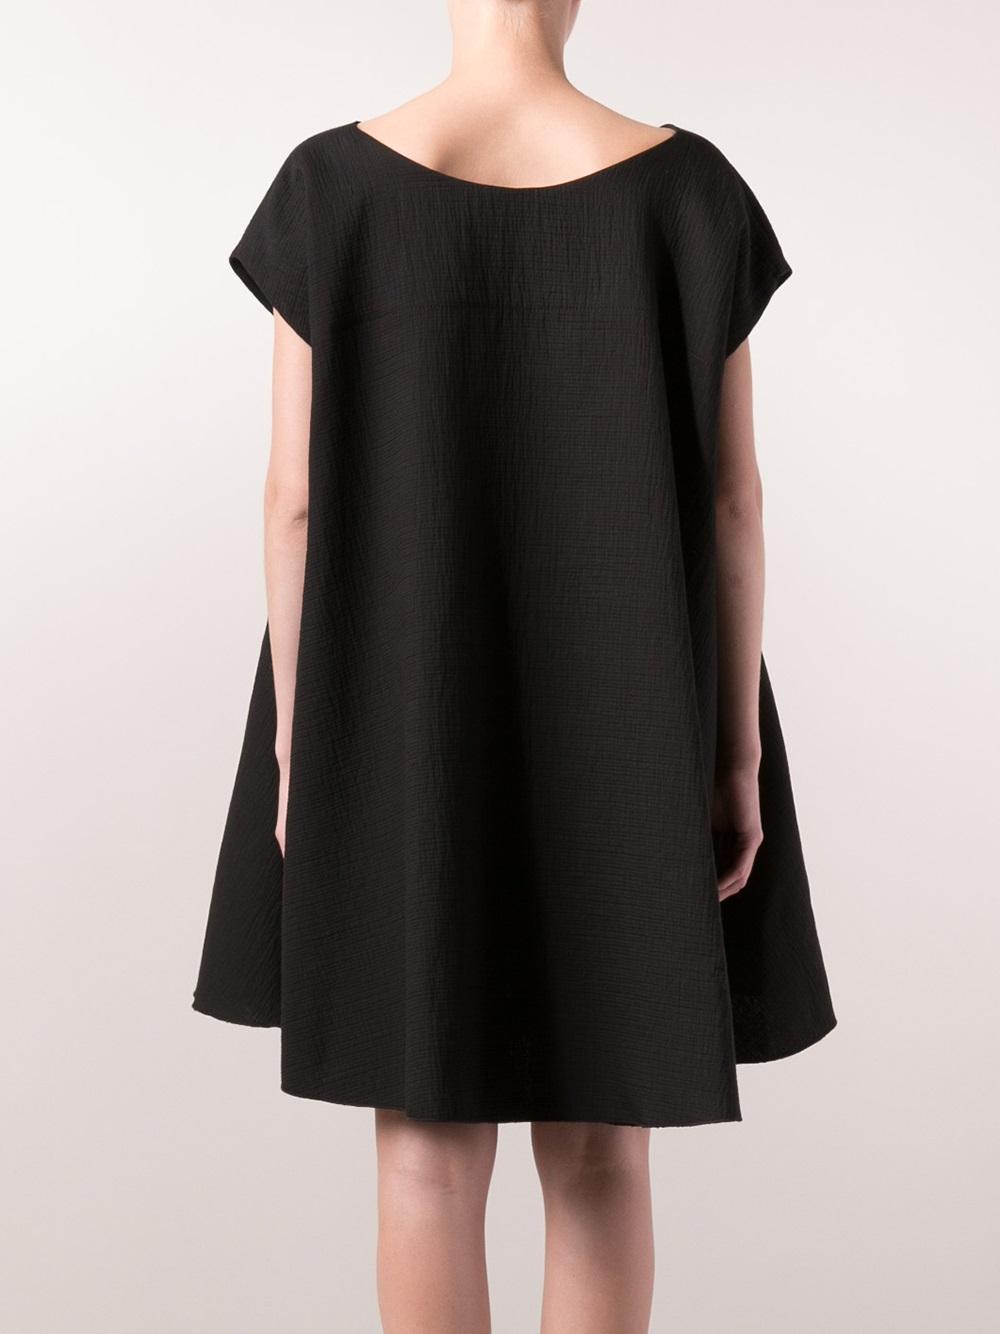 Hache black dress